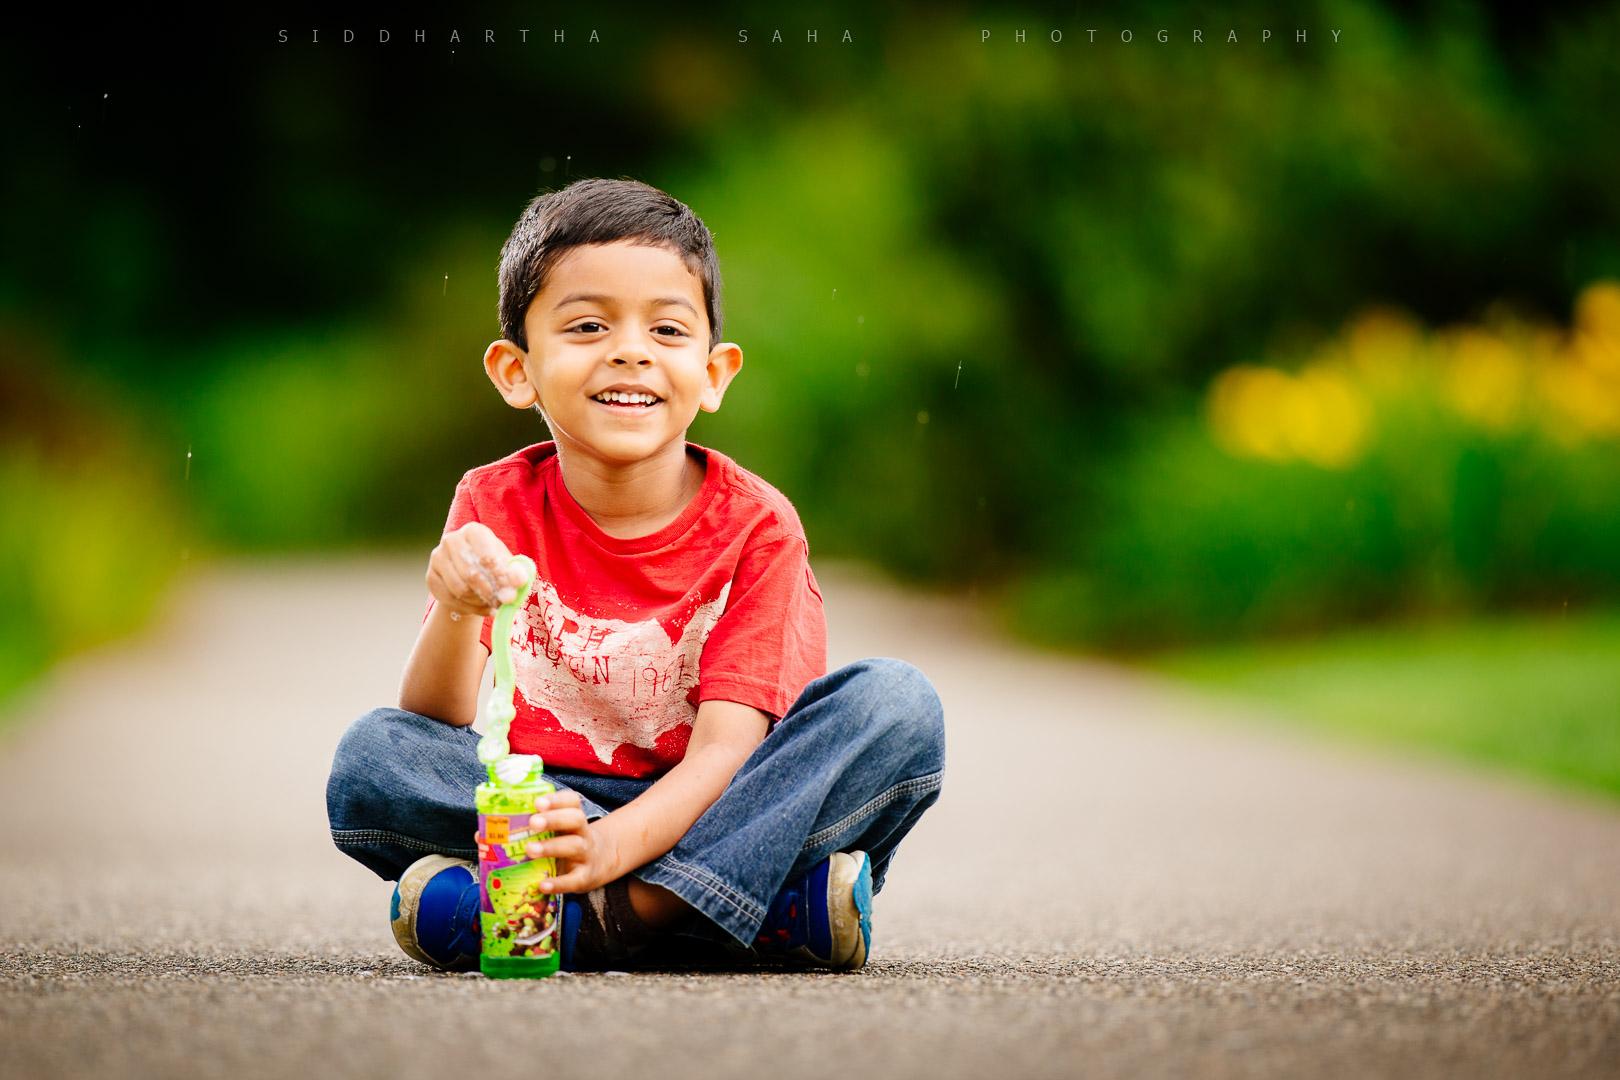 2015-08-08 - Padmaja Ketan Family Photoshoot - _05Y8805